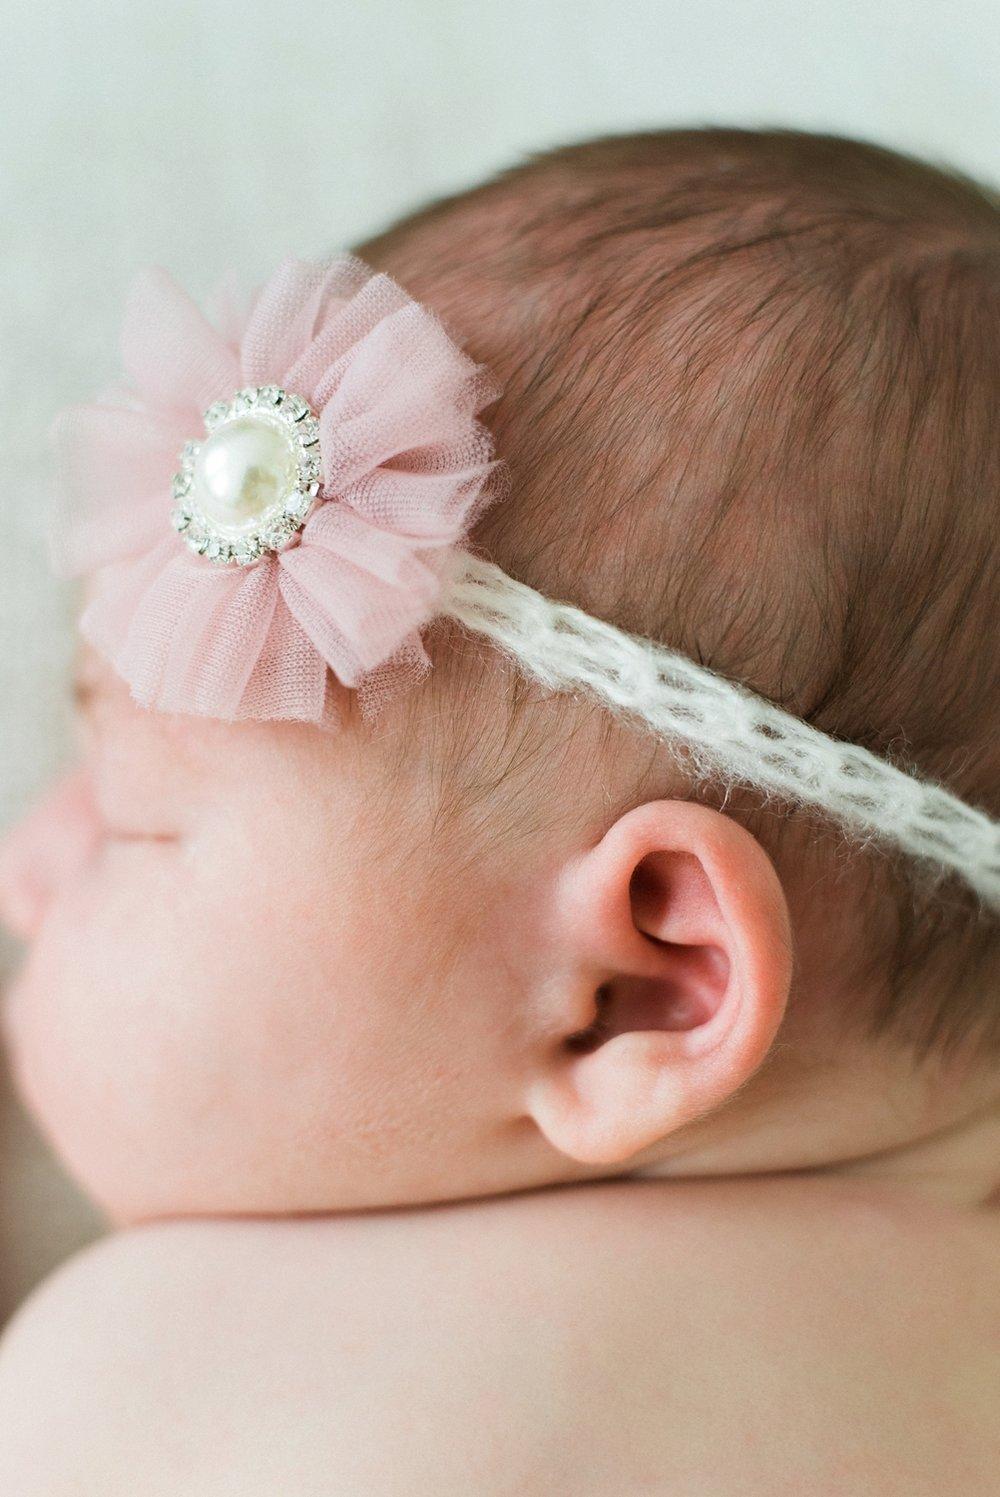 portland-newborn-photographer-baby-girl-pink-tutu-headband-03